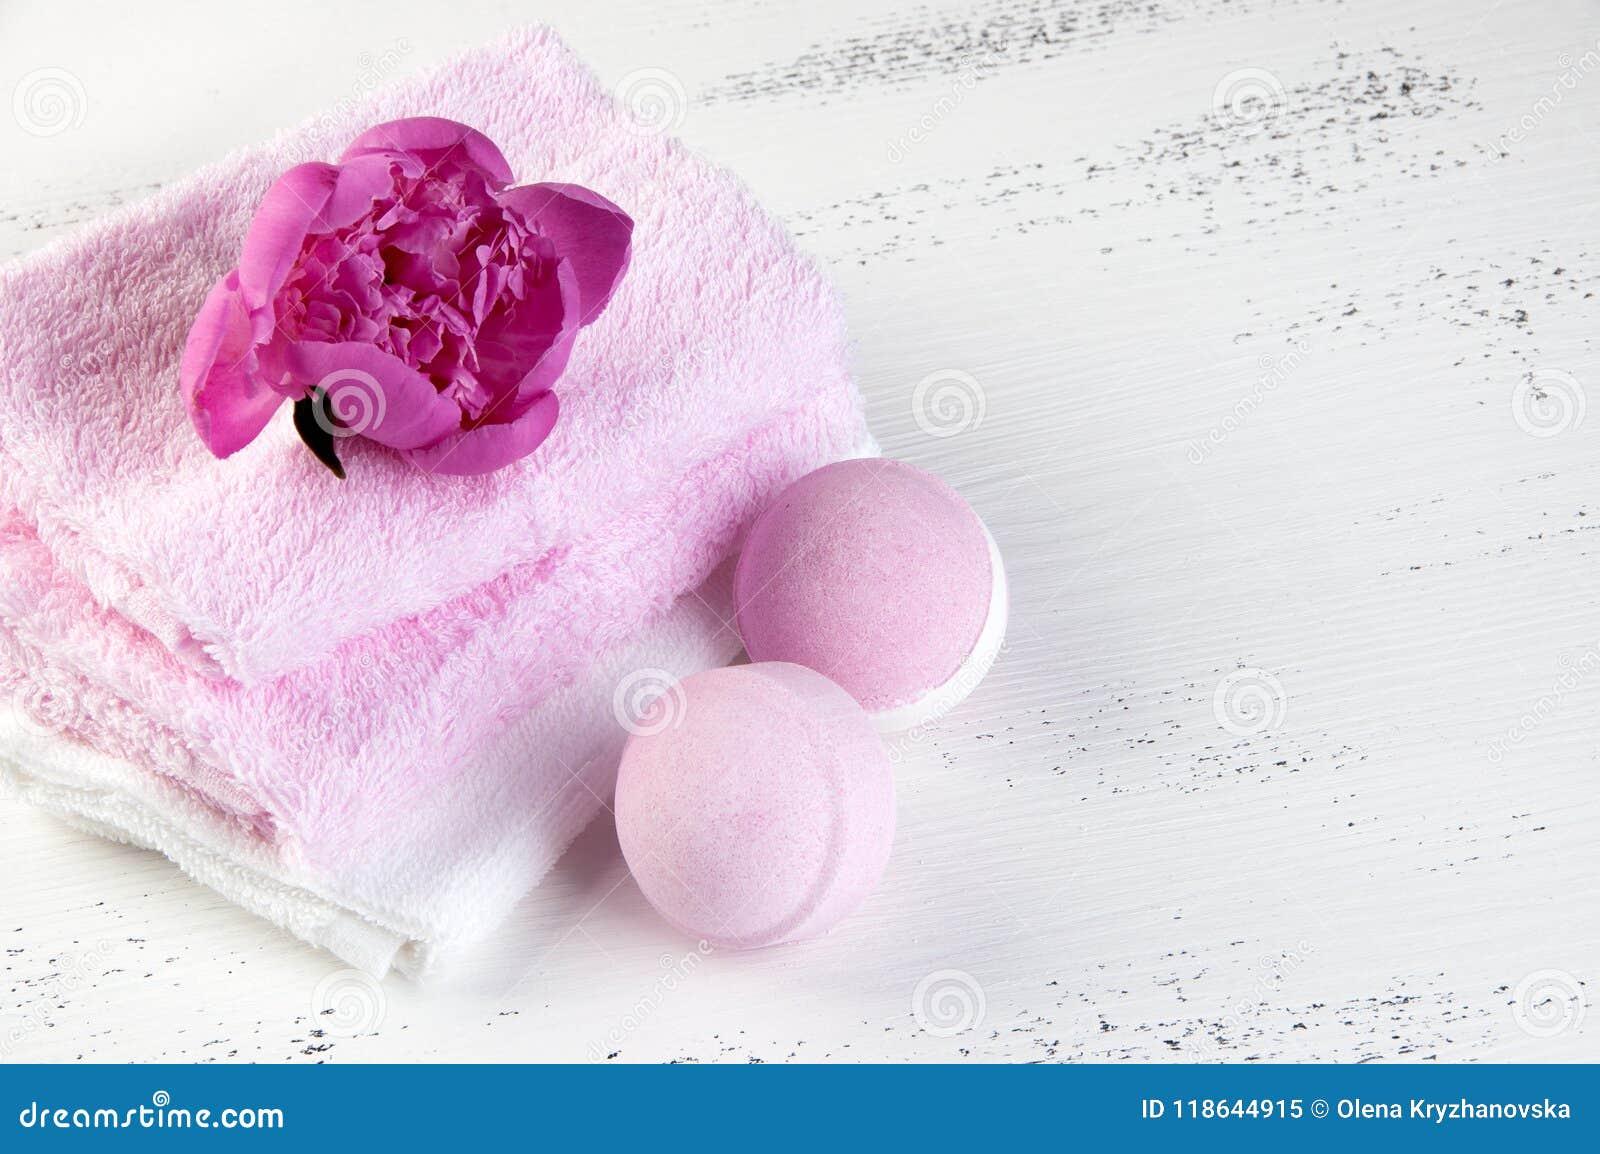 KUUROORDsamenstelling met badbommen en roze pioen